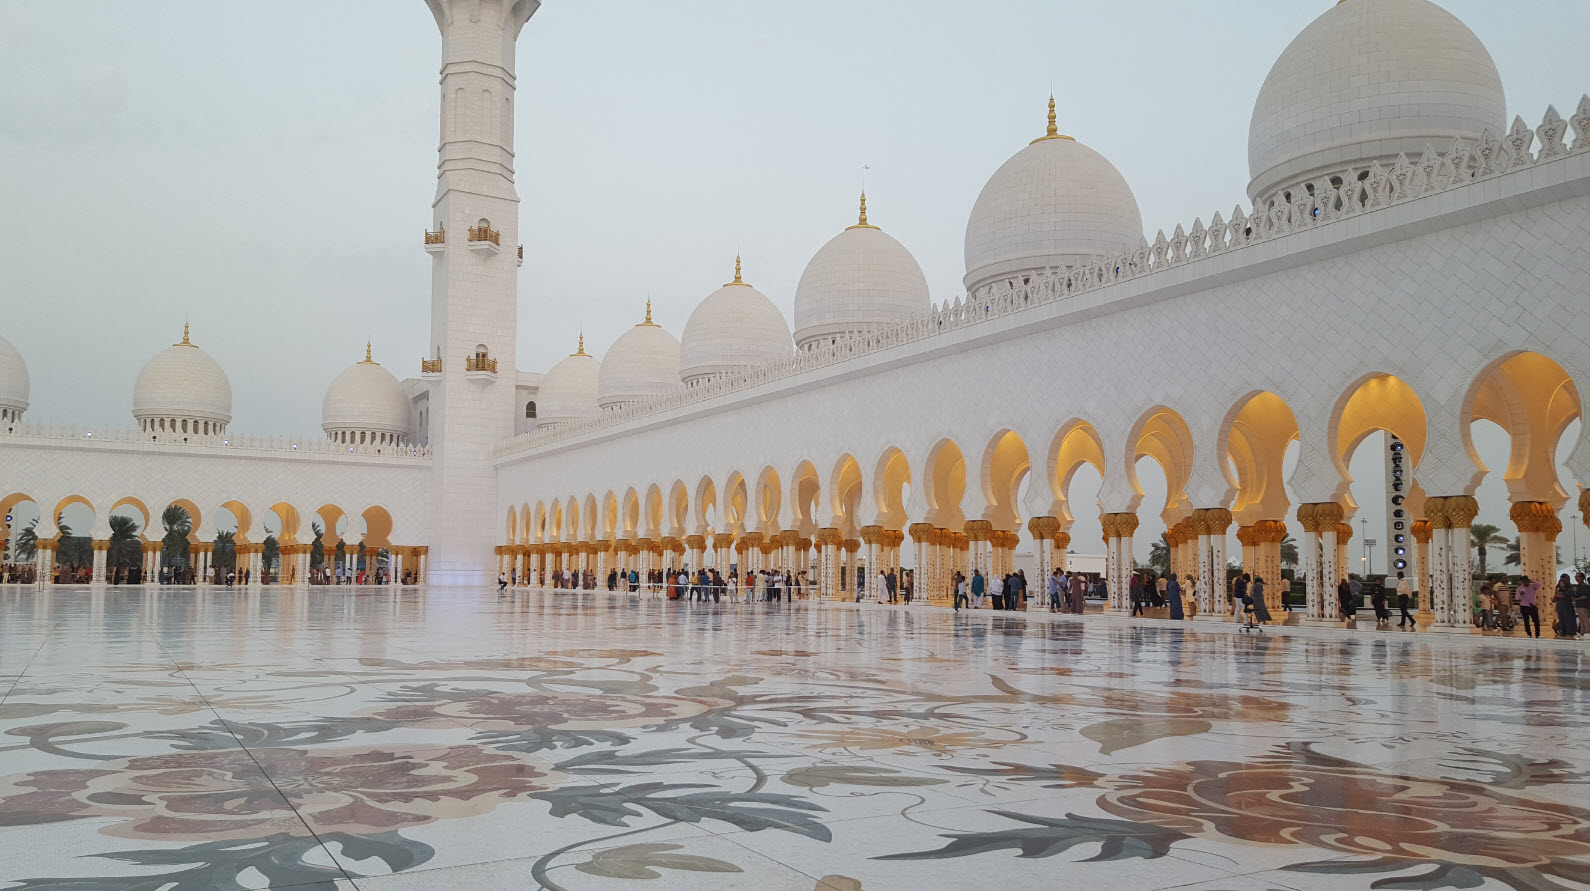 Mosque Abu Dhabi